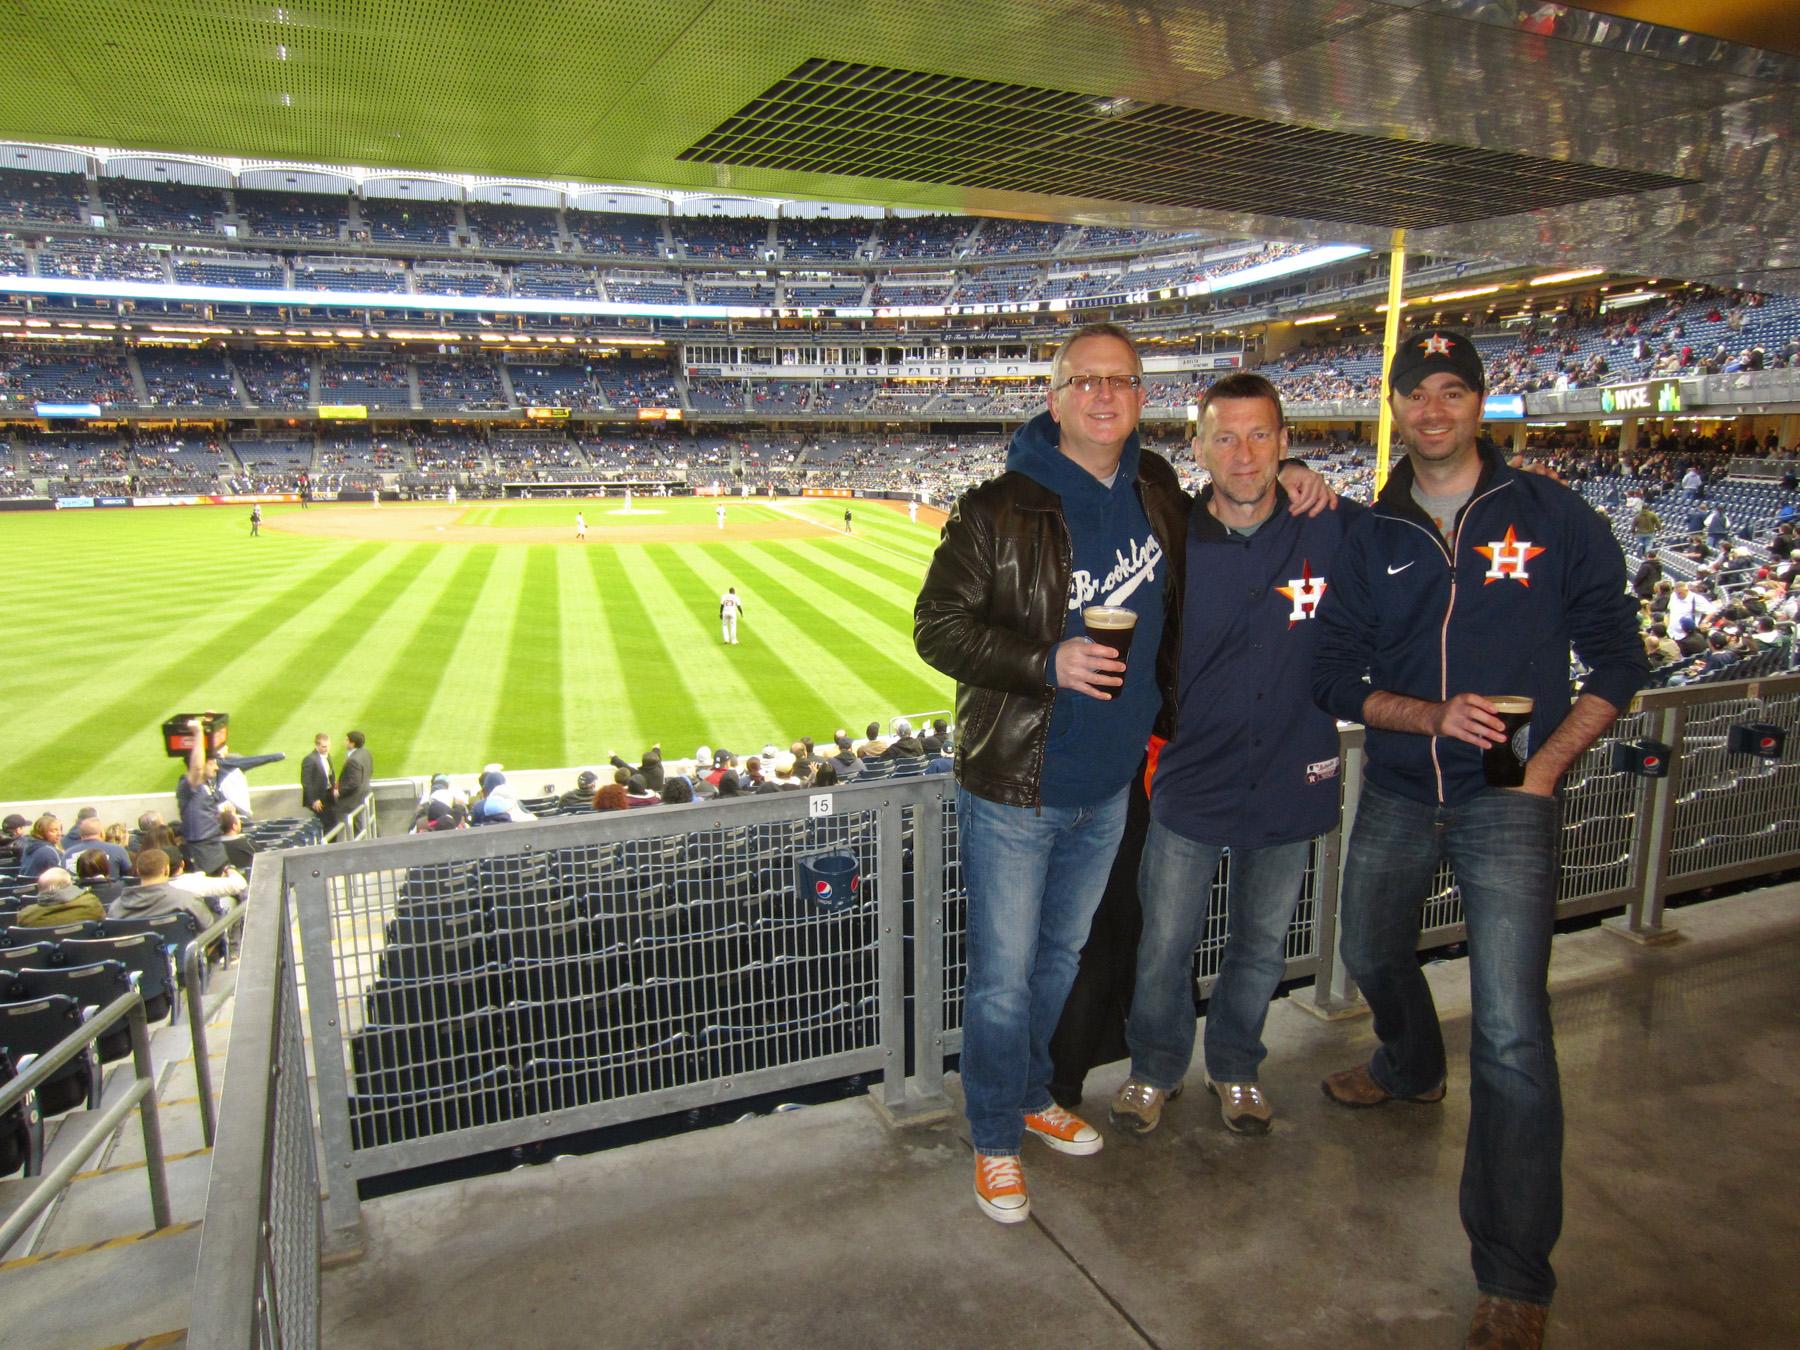 MLB_Astros_Yankees_April29_LR.jpg